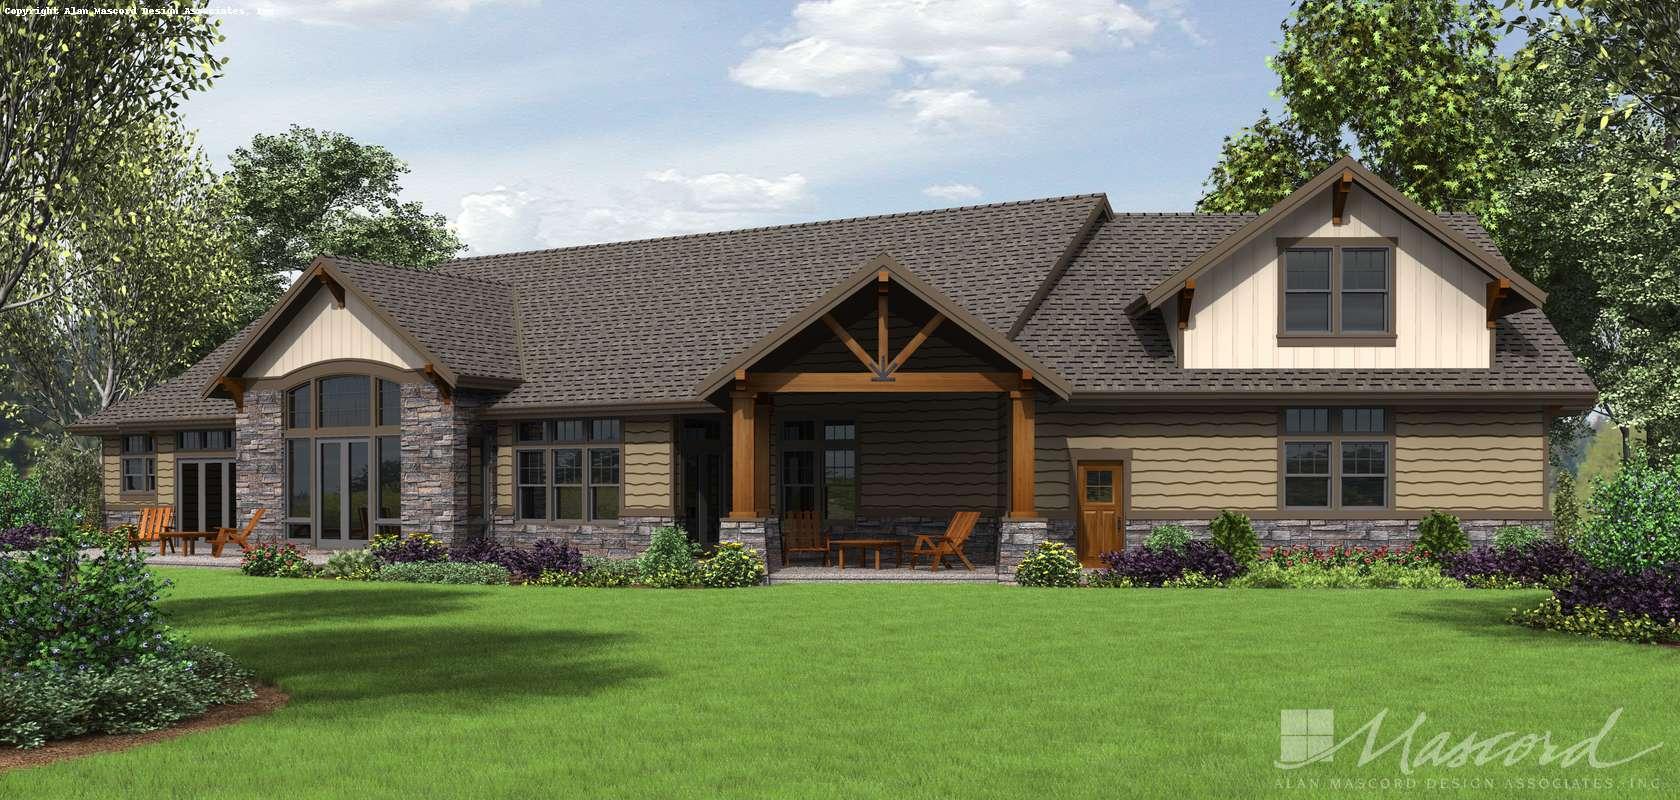 Mascord House Plan 1345: The Wilson